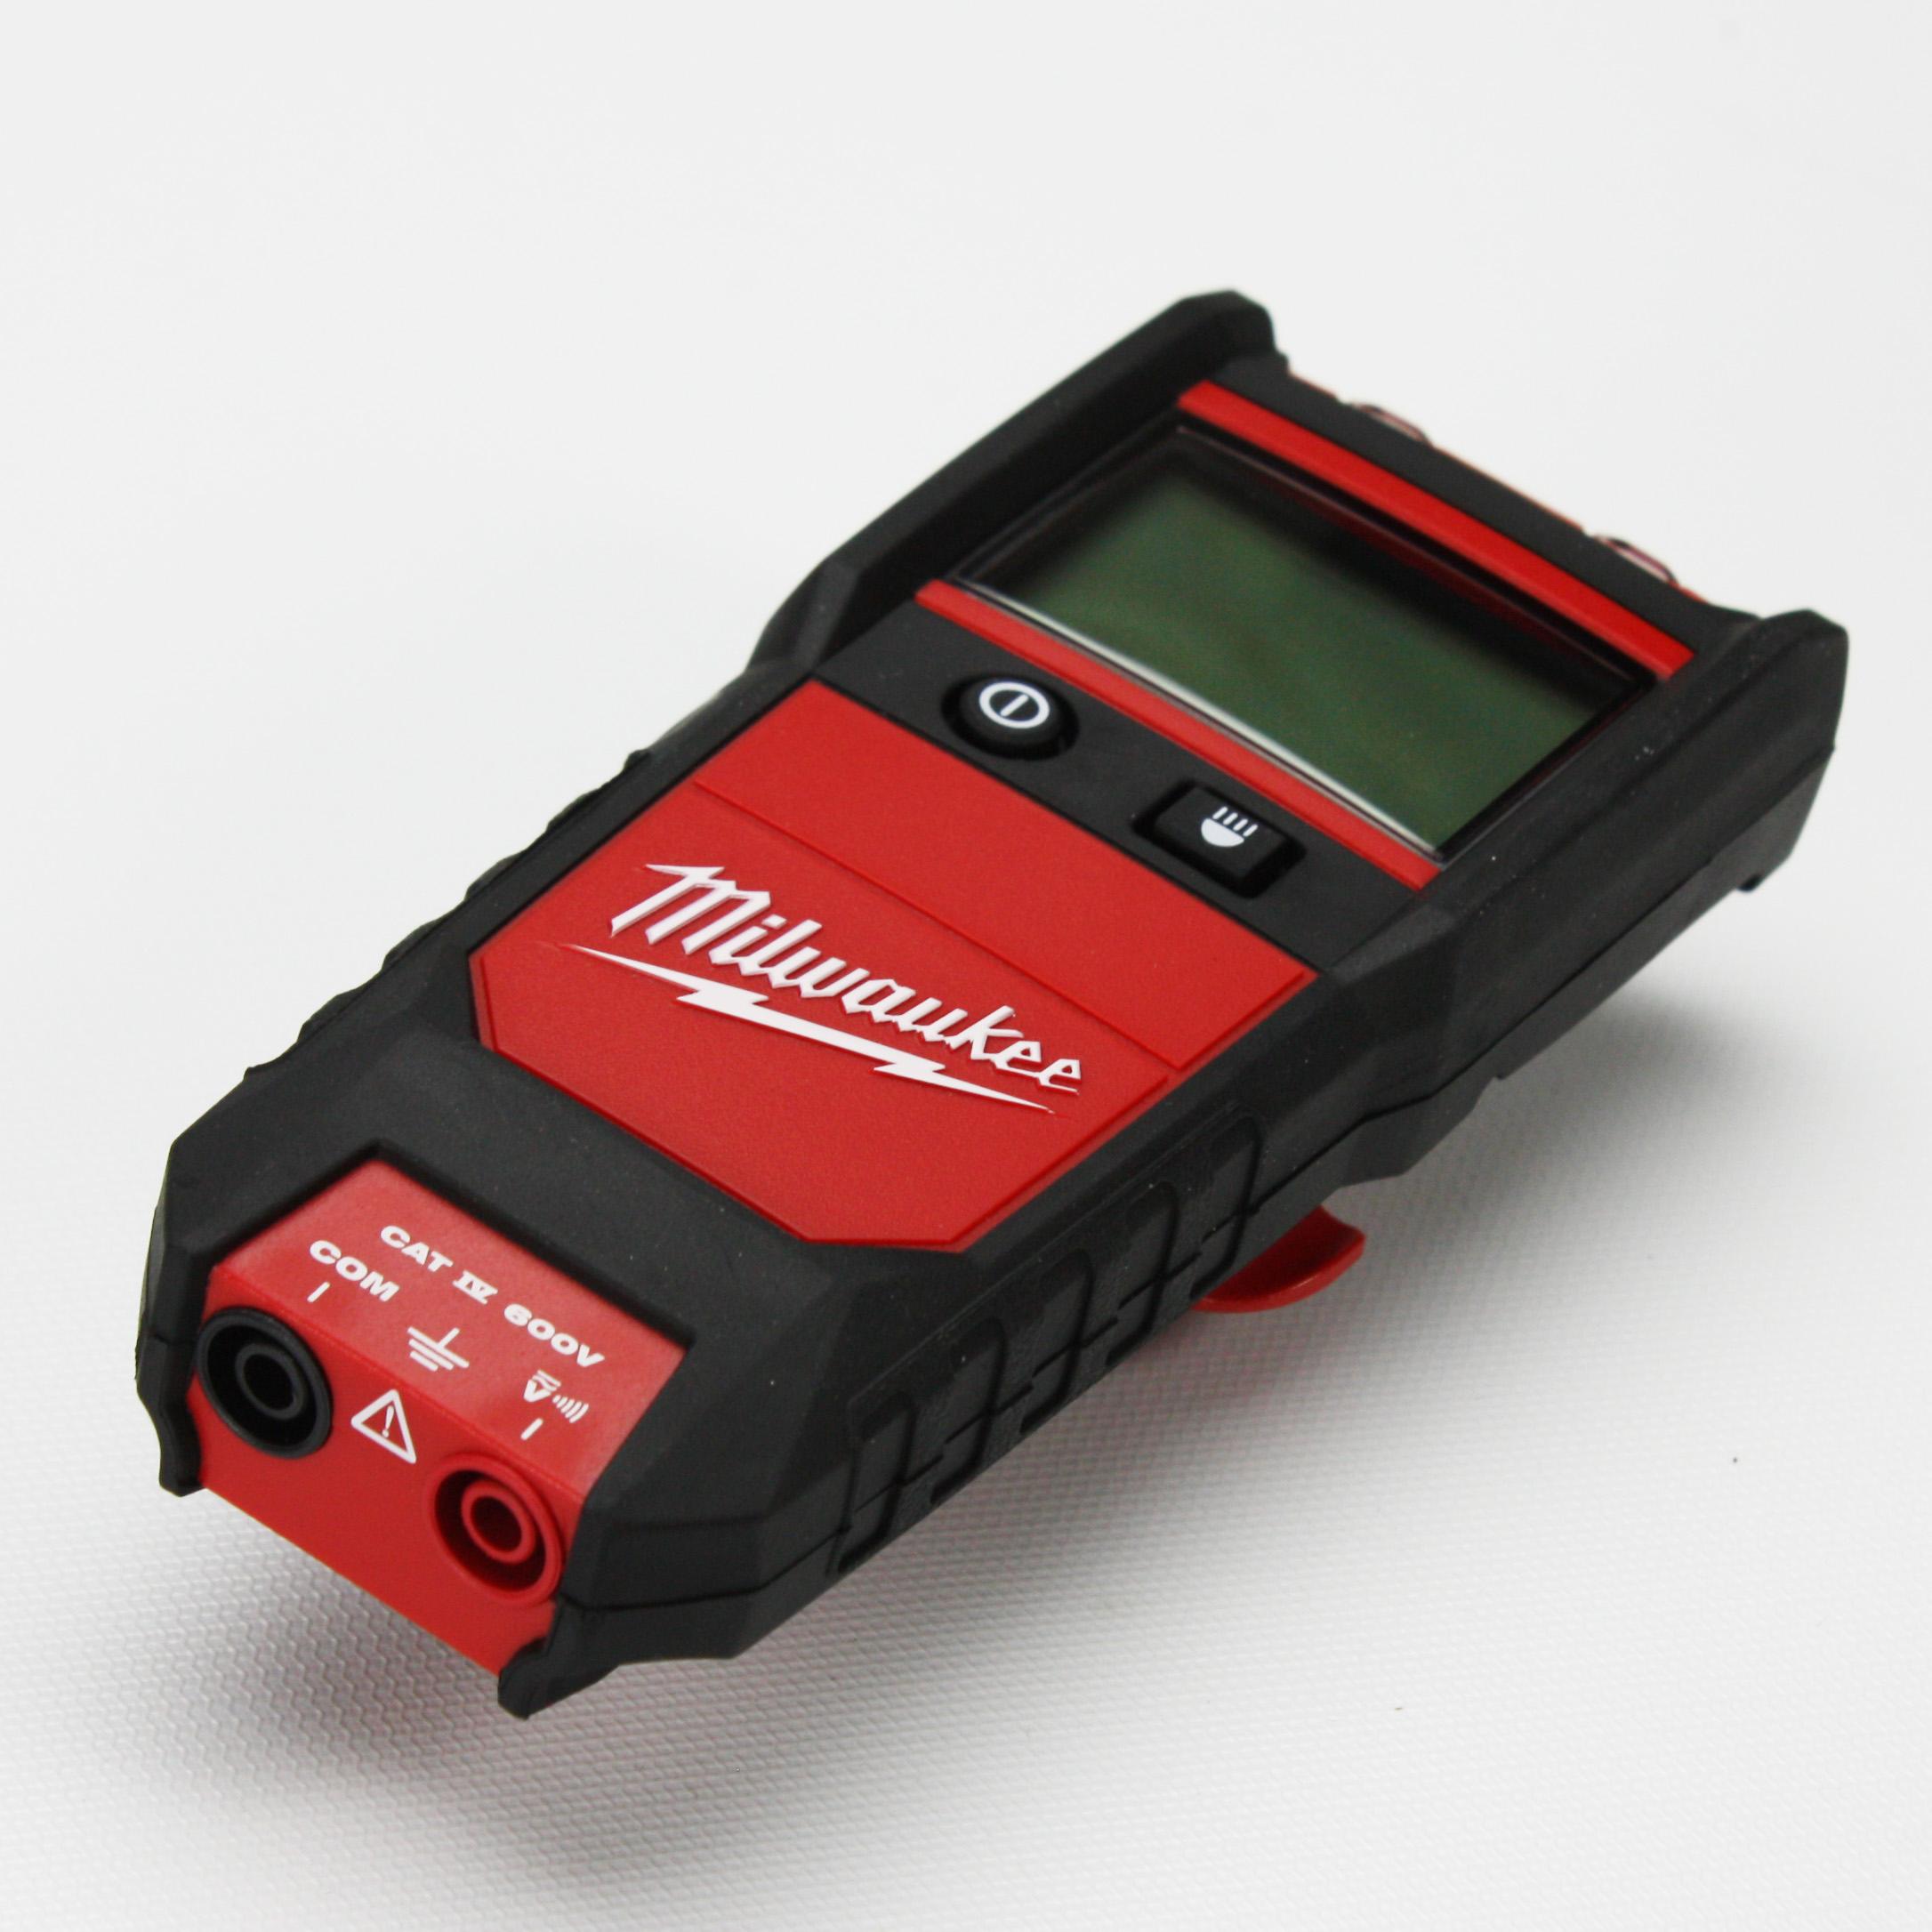 Milwaukee Voltage Tester : Milwaukee auto voltage continuity tester ebay